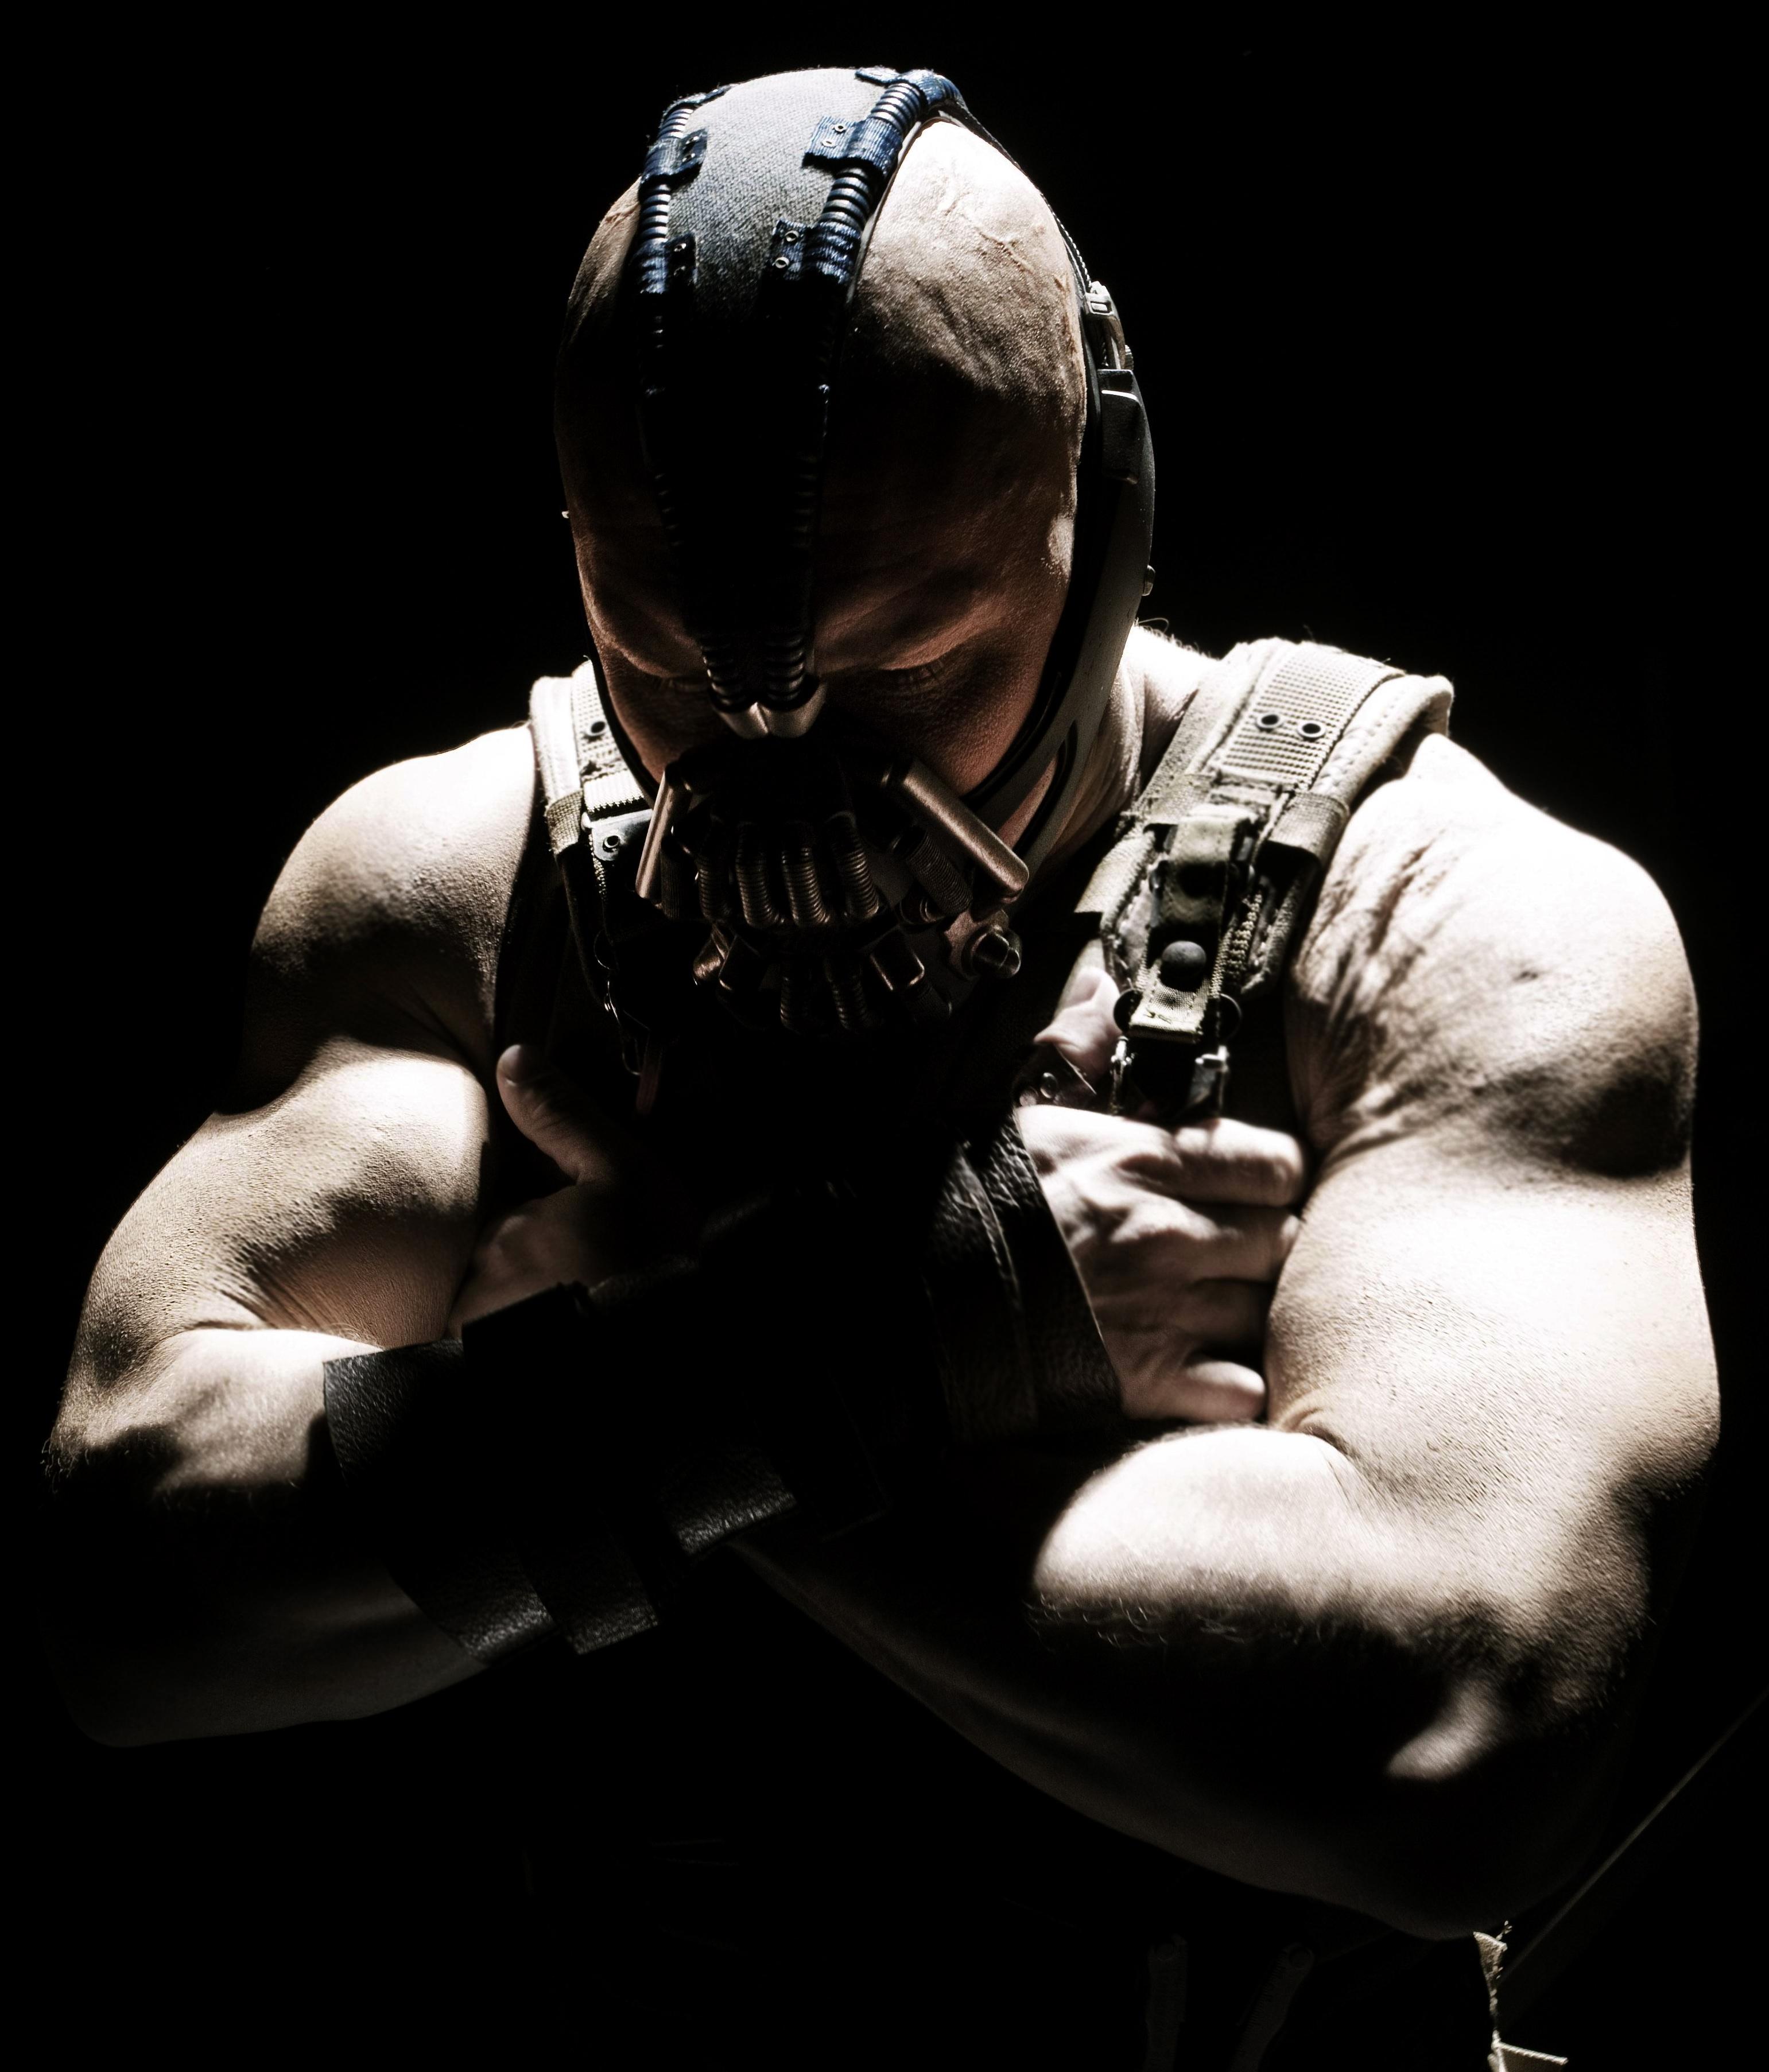 Tom Hardy To Portray Villain Bane In Batman Movie